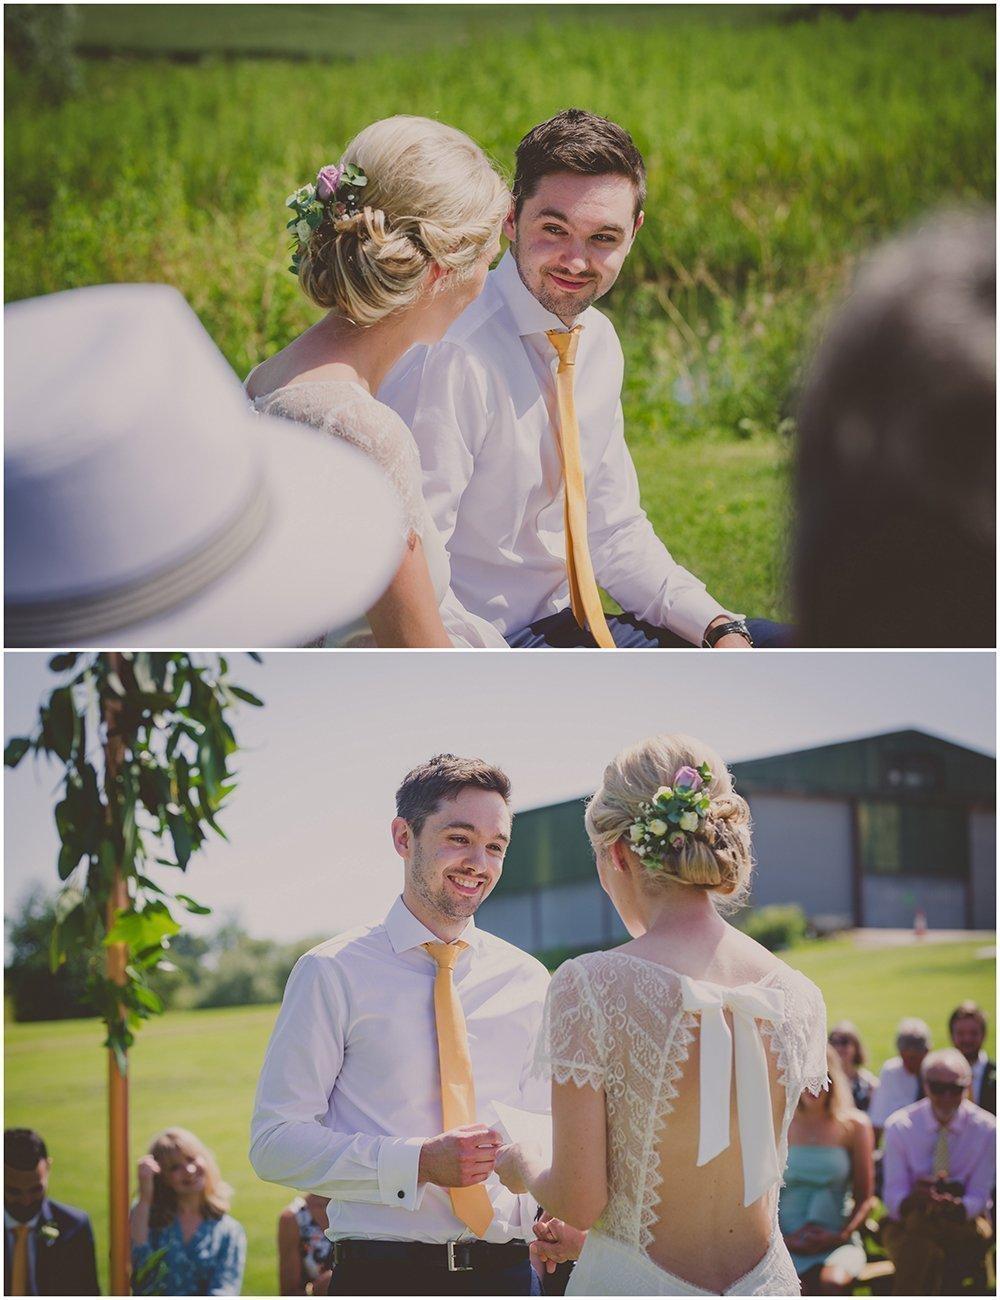 Newton Park Barn Wedding Flowers